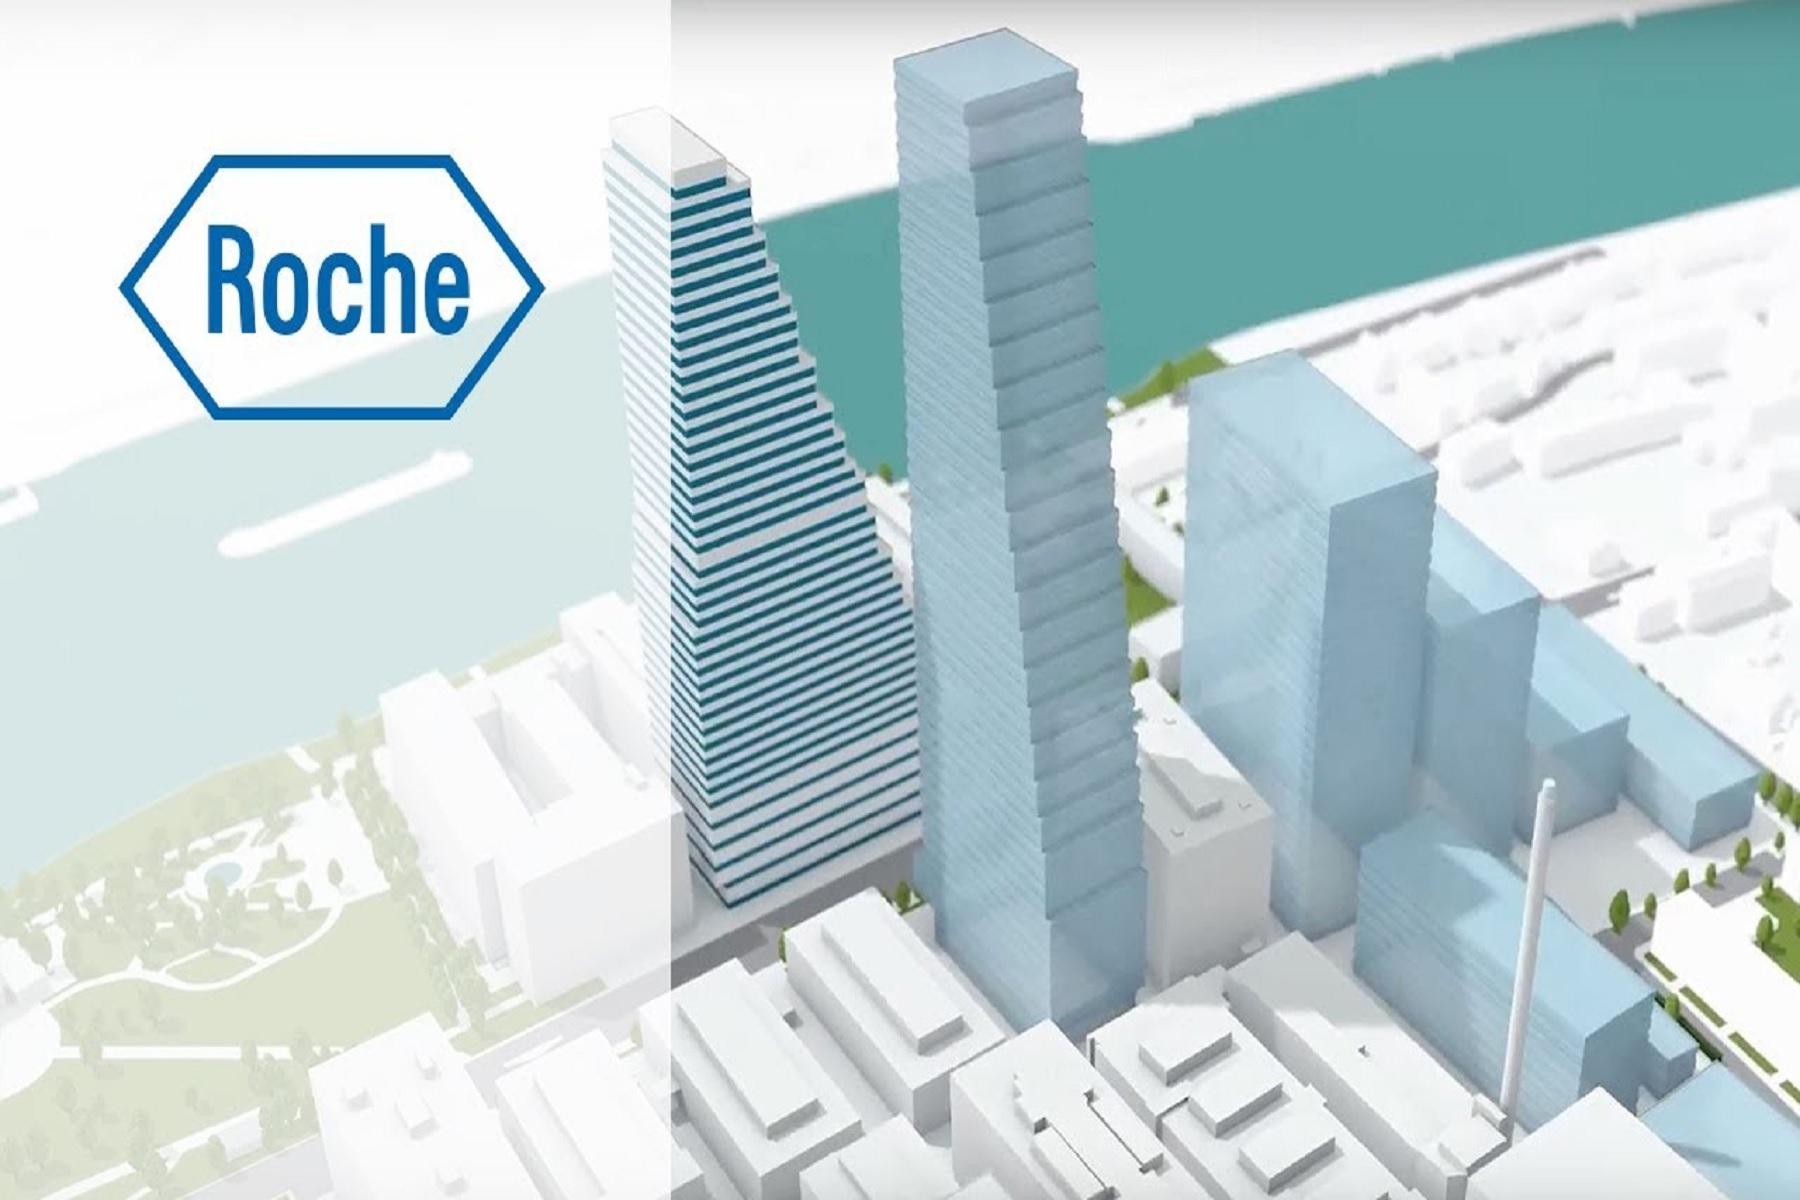 Roche φαρμακοβιομηχανία επένδυση: 500 εκατ. σε νέο παγκόσμιο κέντρο λειτουργίας